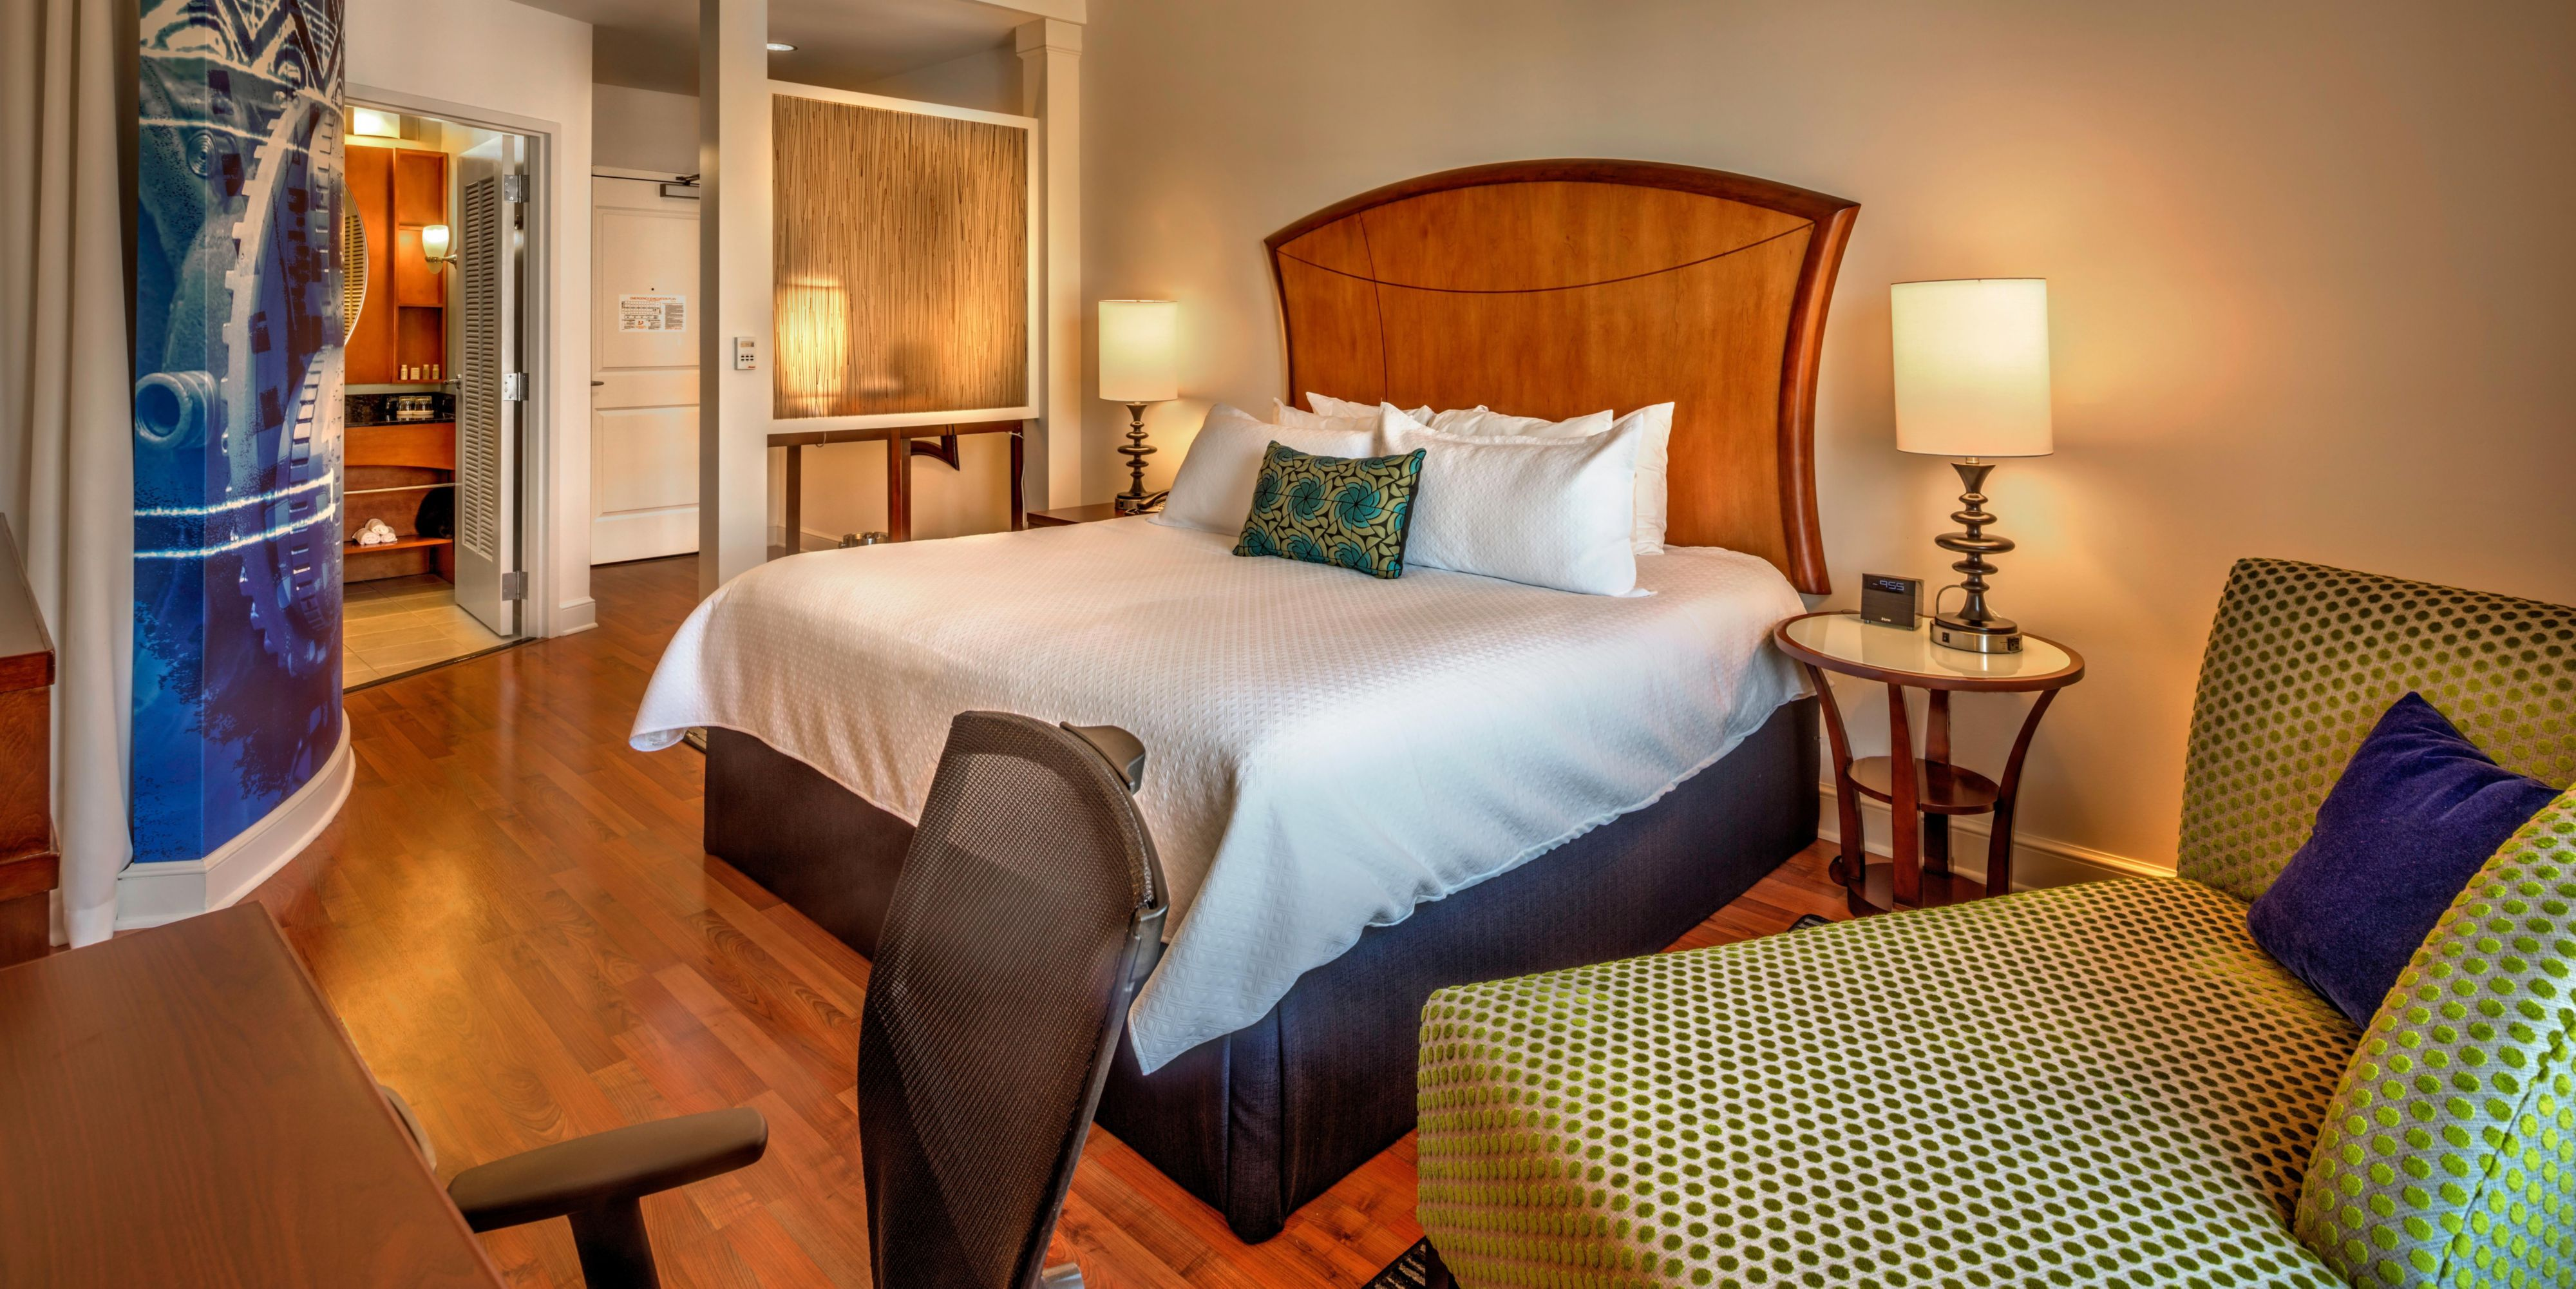 Hotel Indigo Jacksonville-Deerwood Park image 1